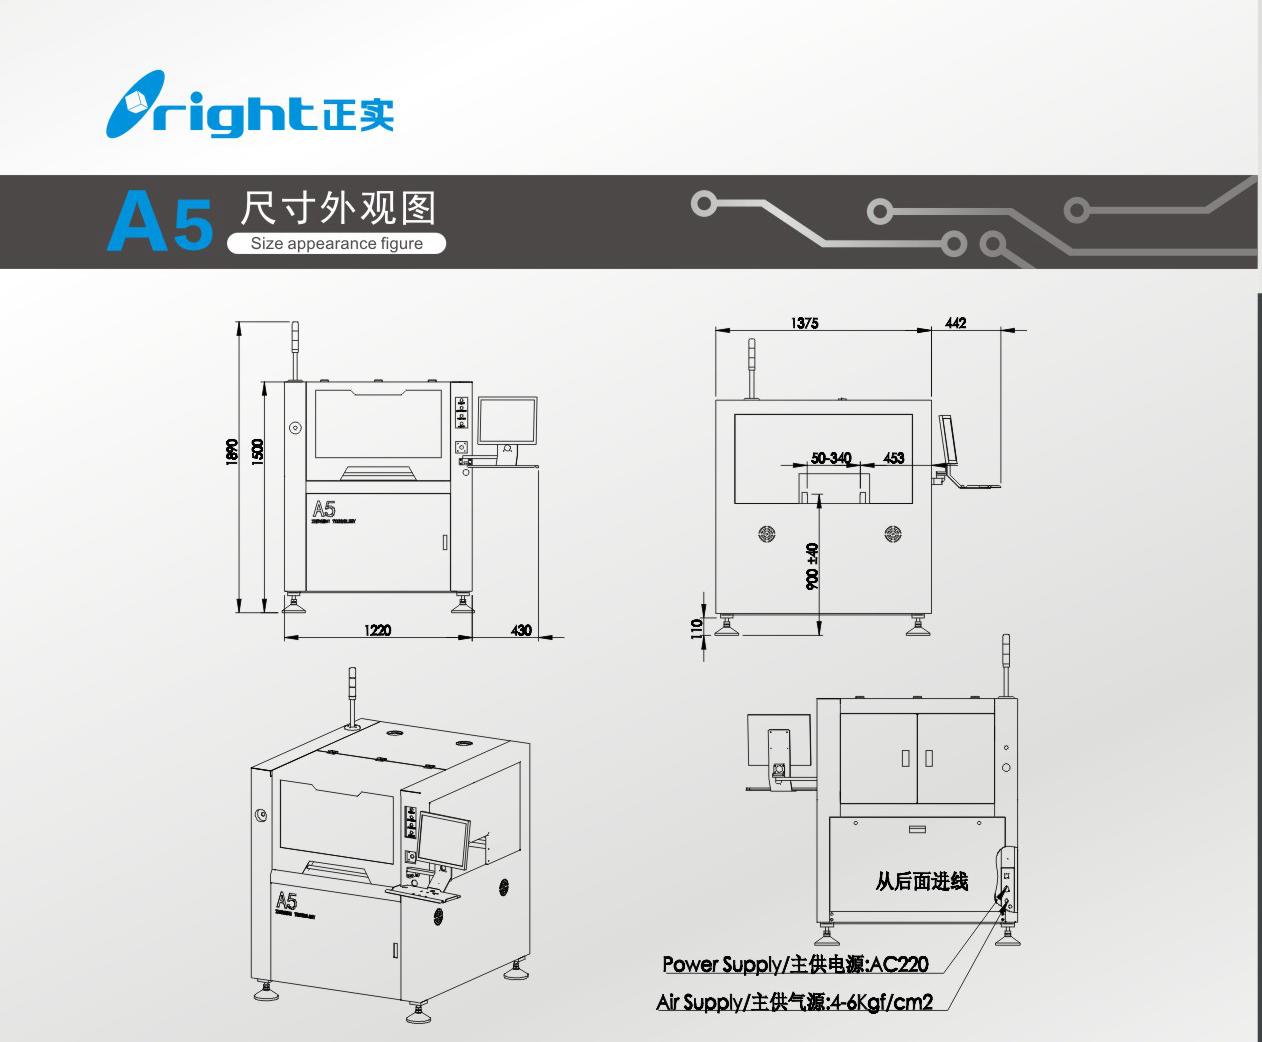 (A5) 机器尺寸.jpg